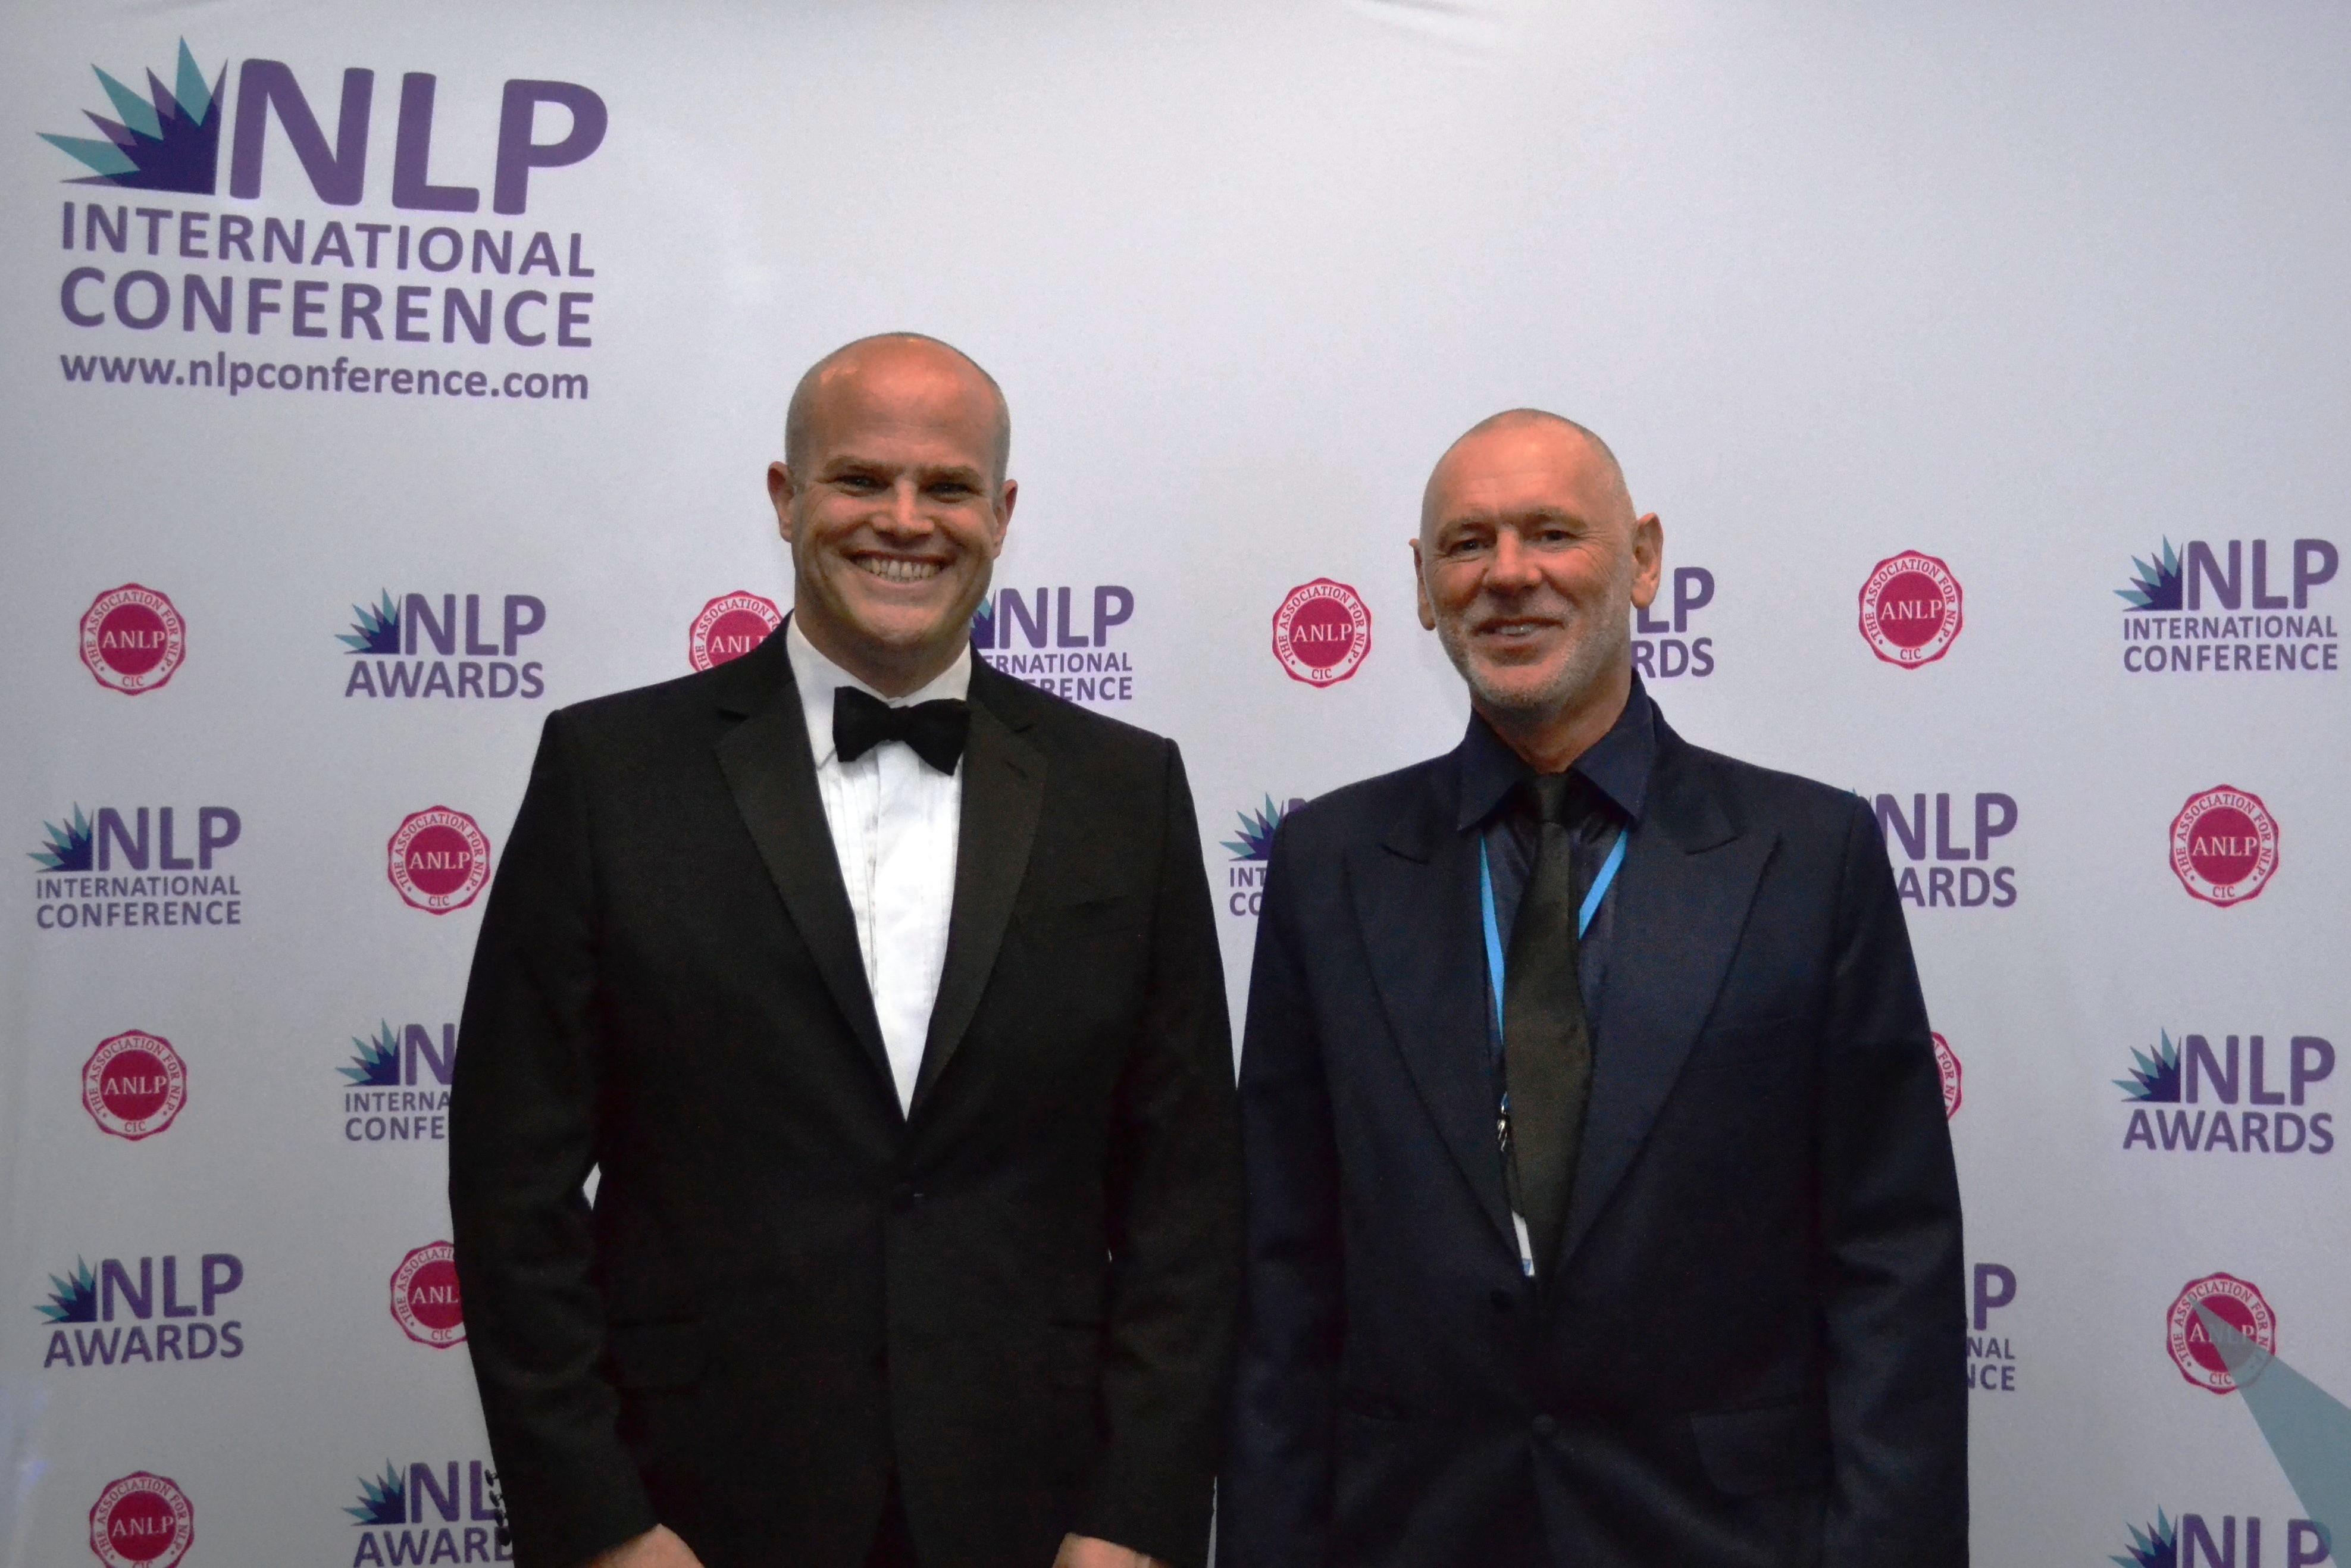 2017 NLP Award finalists